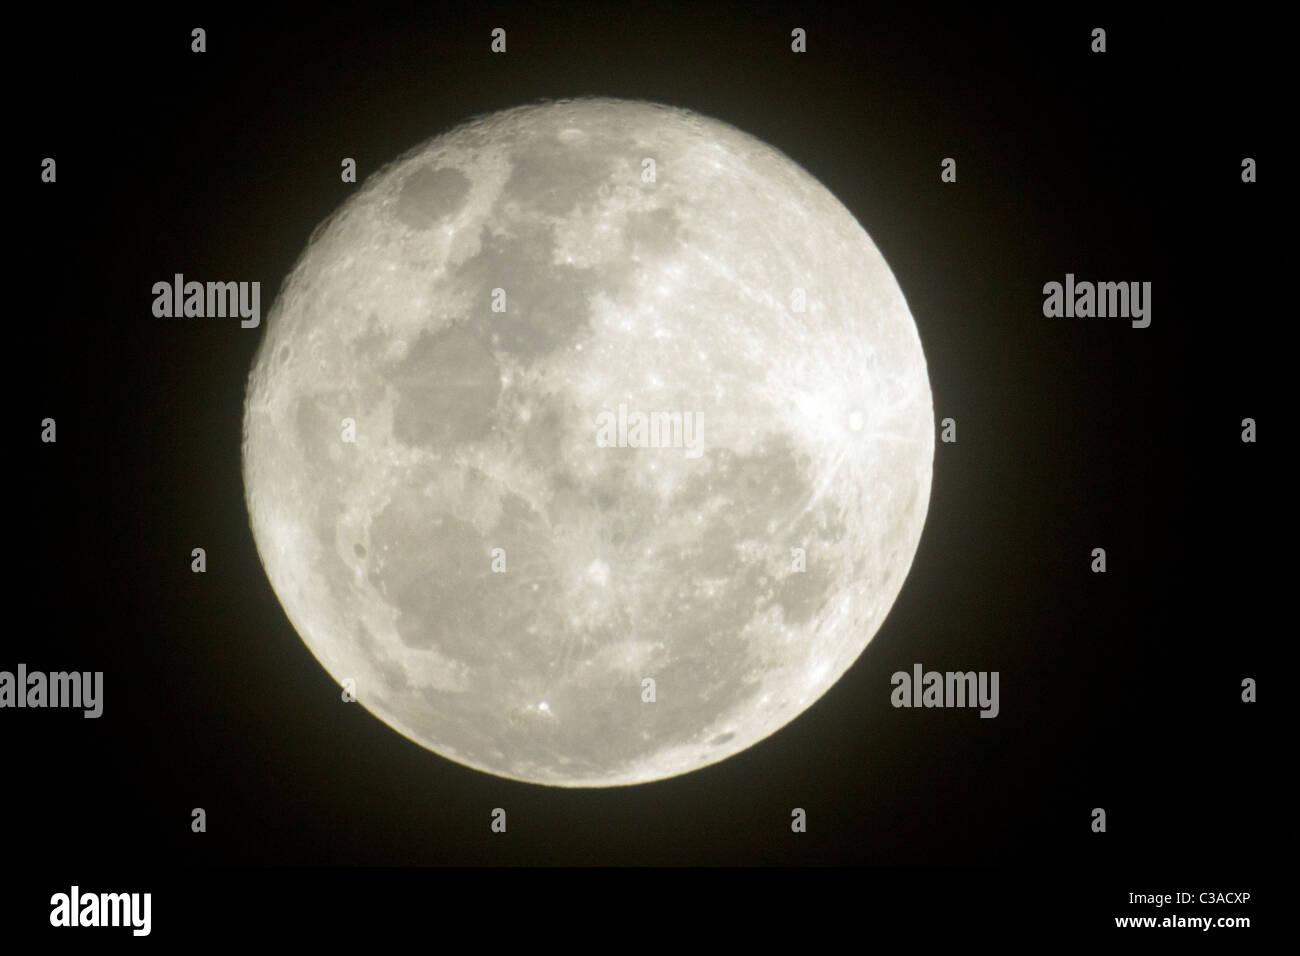 Full Moon from Trikora Beach in Tg Pinang, Indones Stock Photo